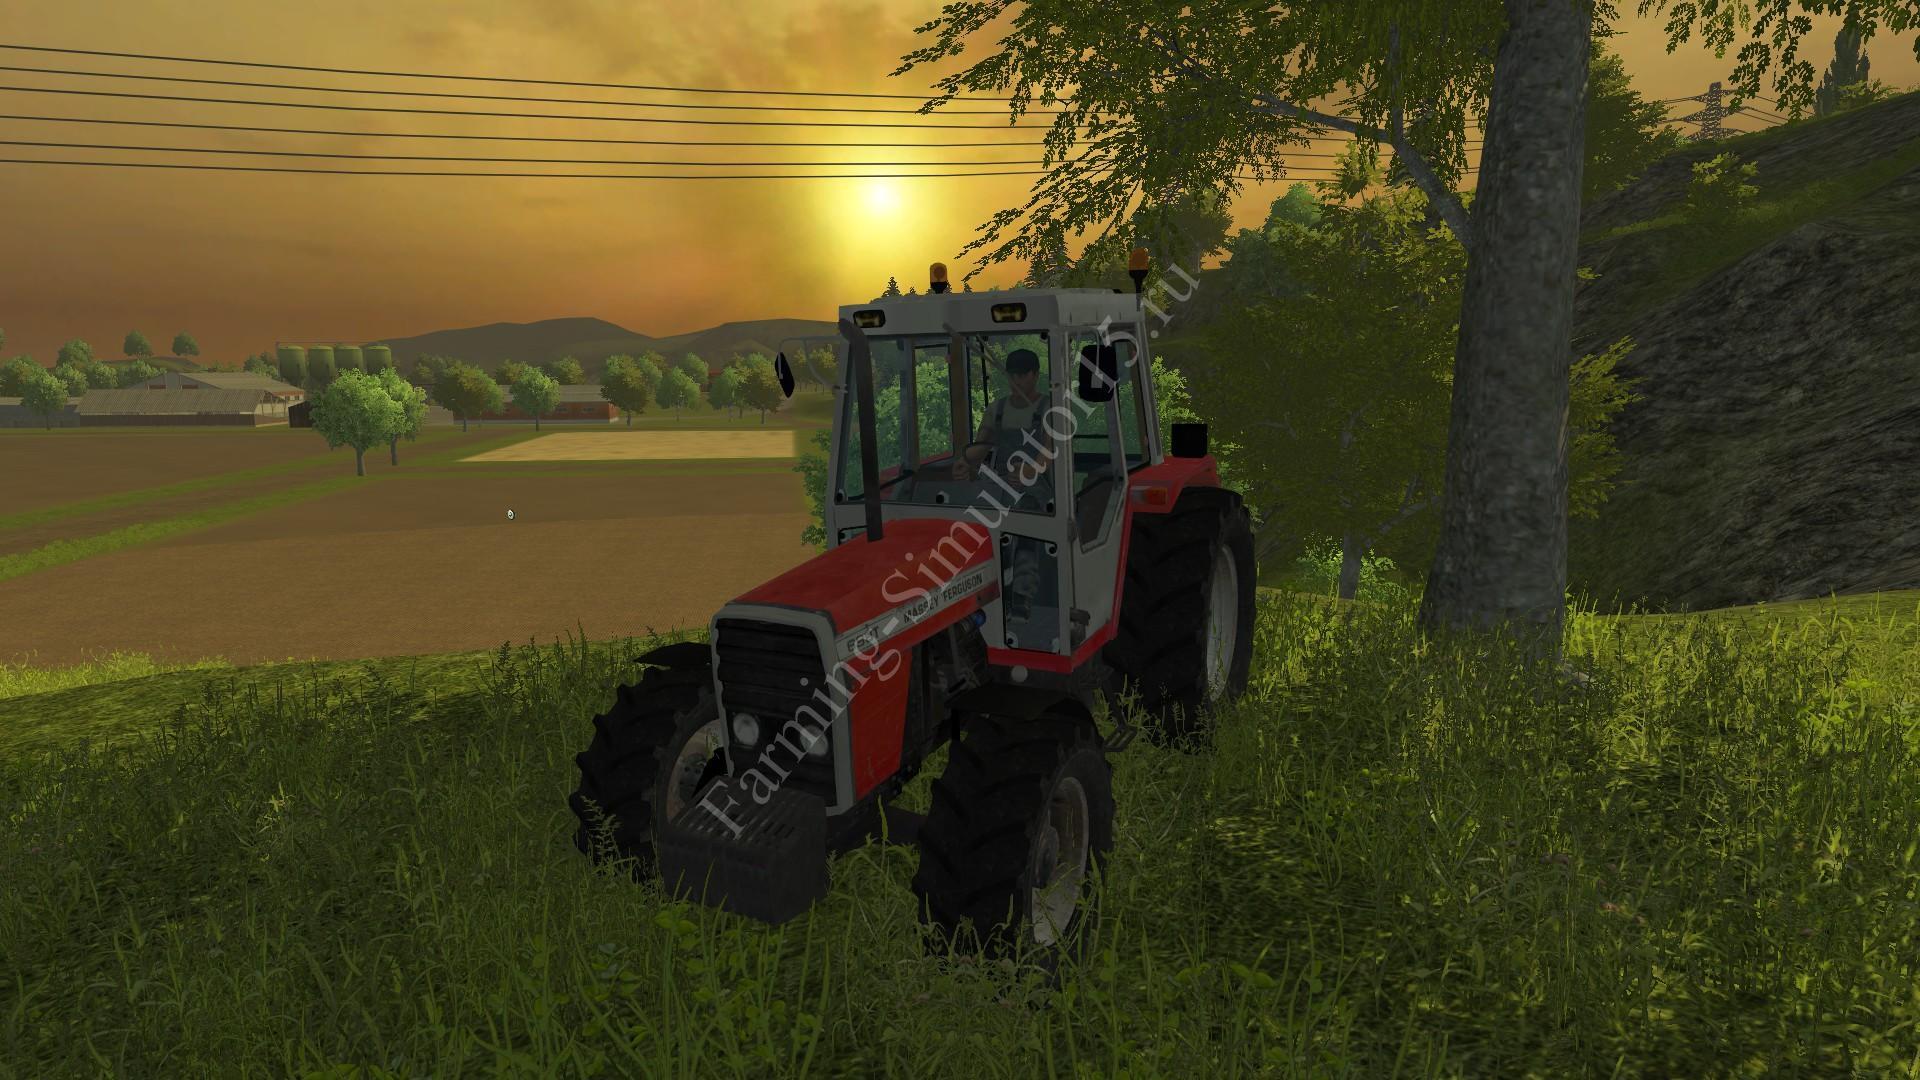 Мод трактора Massey Ferguson 698T v 1.3 More Realistic Farming Simulator 2013, Farming Simulator 13